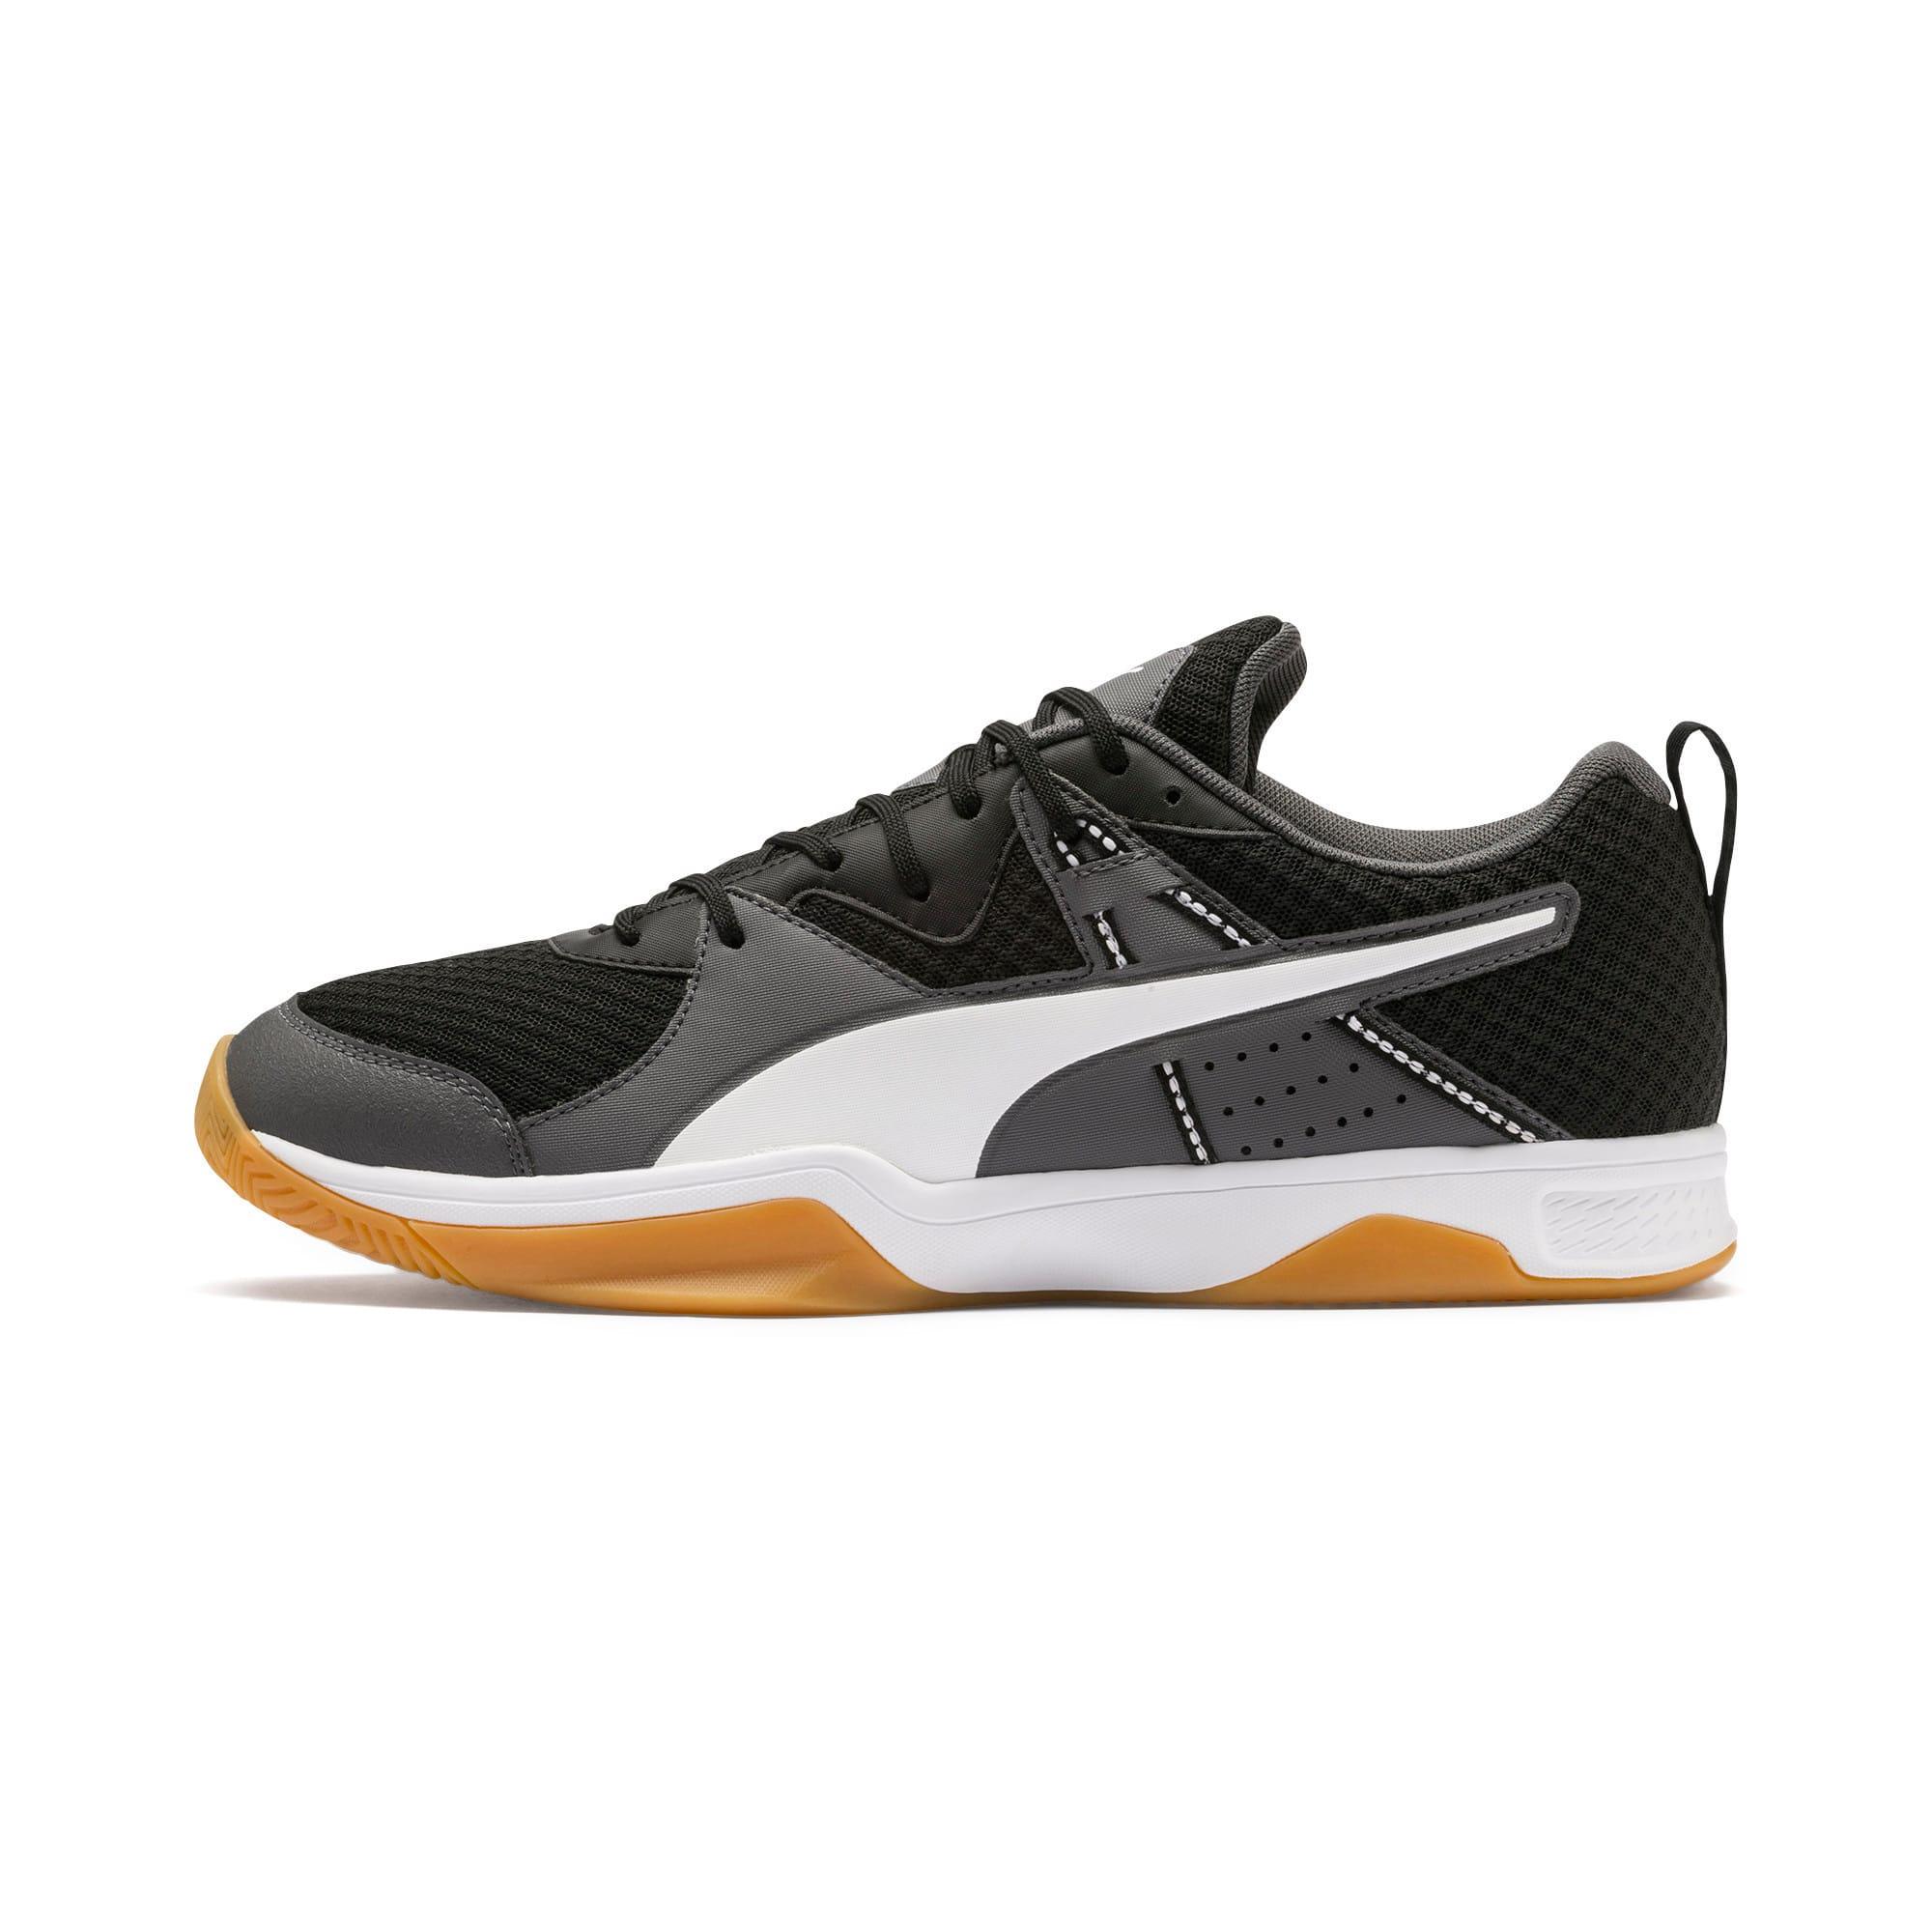 Thumbnail 1 of PUMA Stoker.18 Indoor Training Shoes, Black-White-Iron Gate-Gum, medium-IND